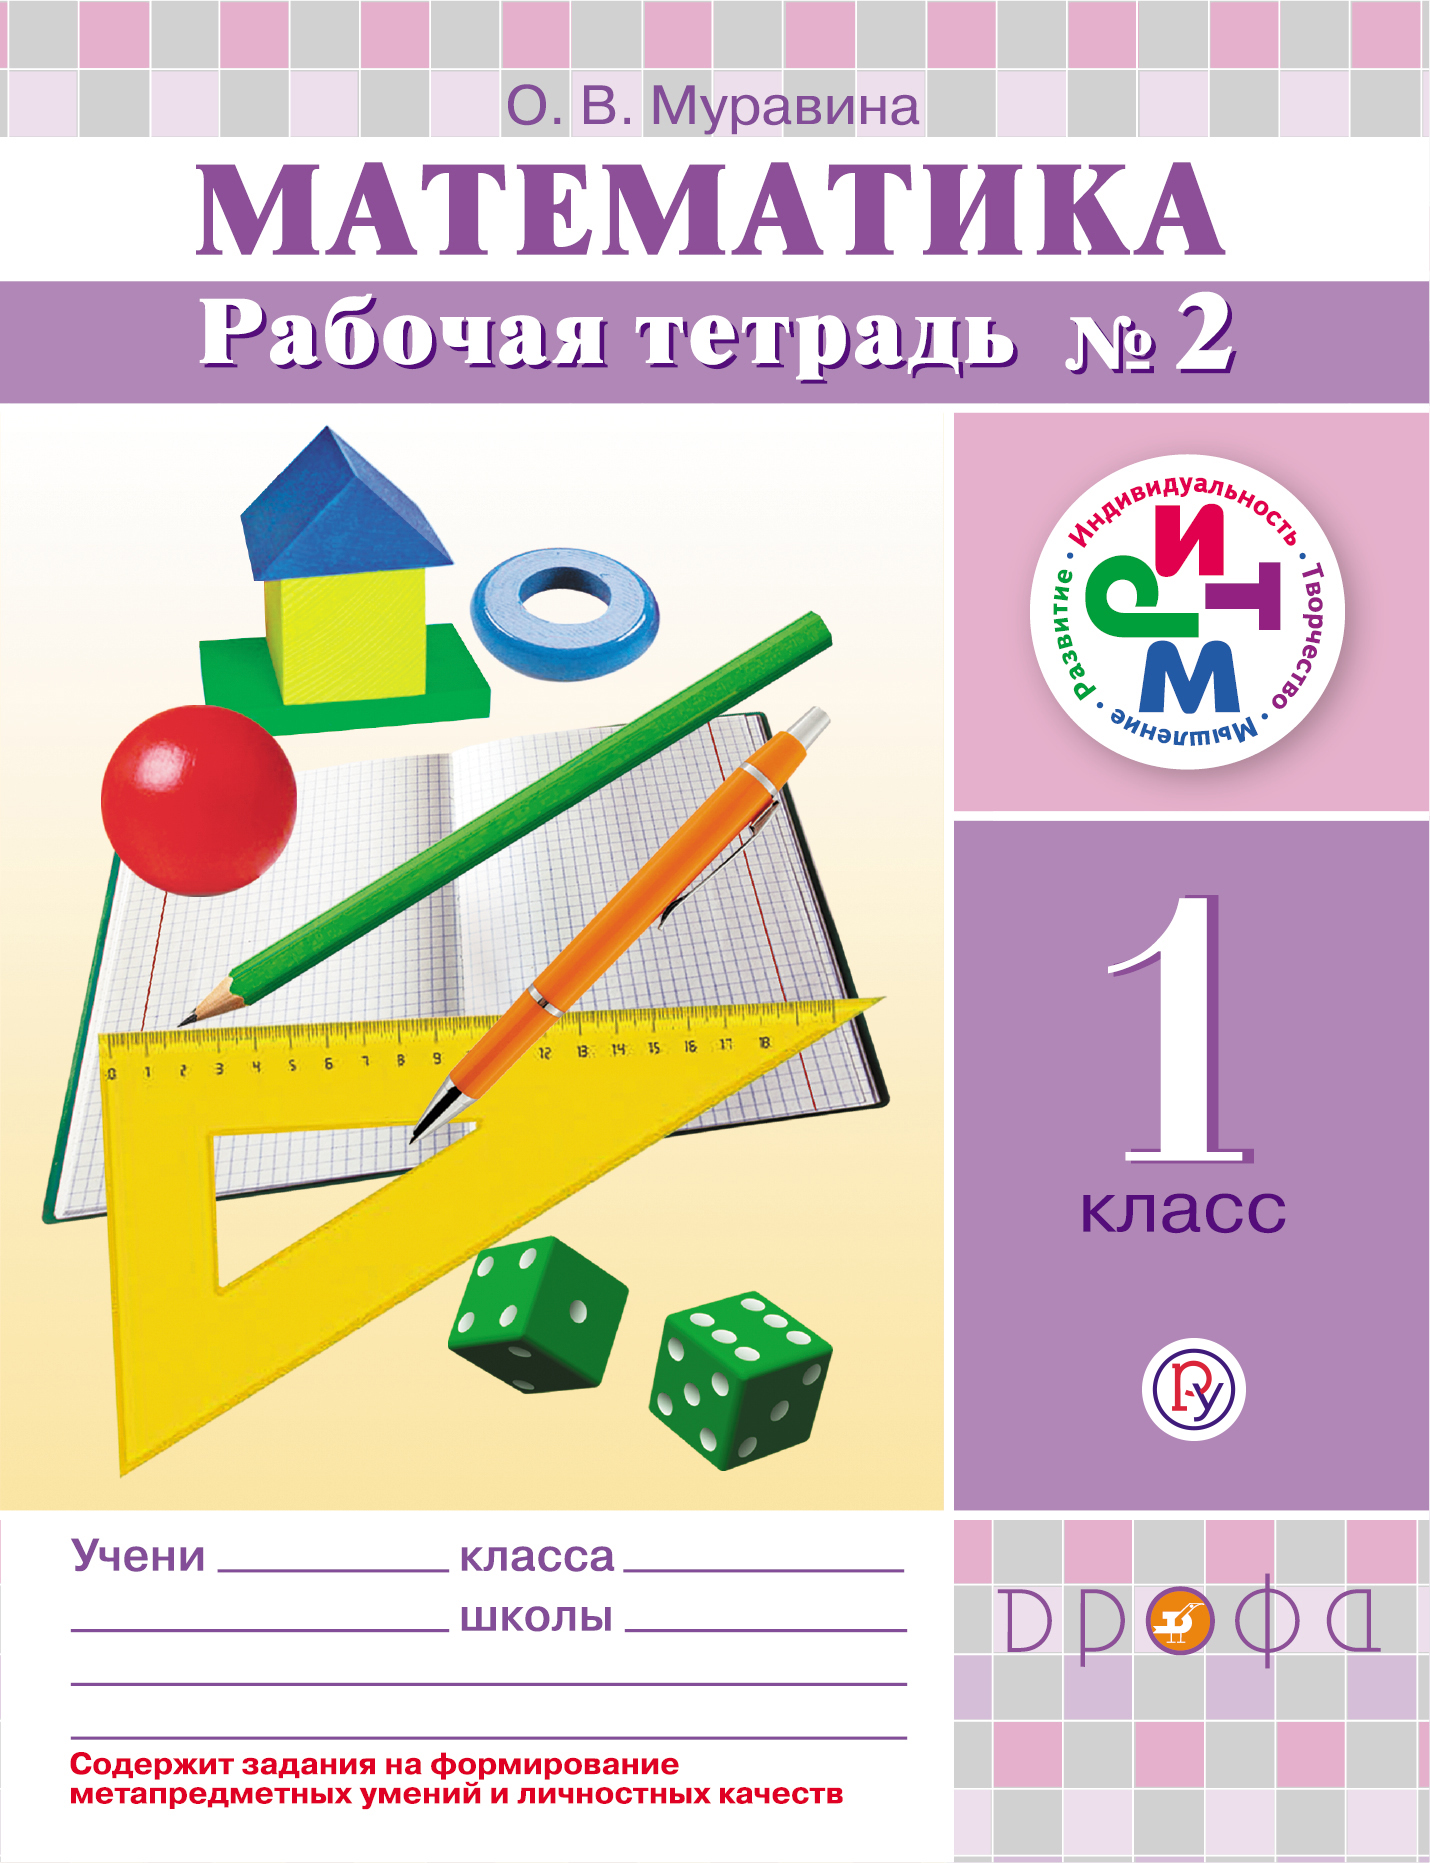 Муравина О.В. Математика. 1 класс. Рабочая тетрадь №2 математика 6 класс рабочая тетрадь